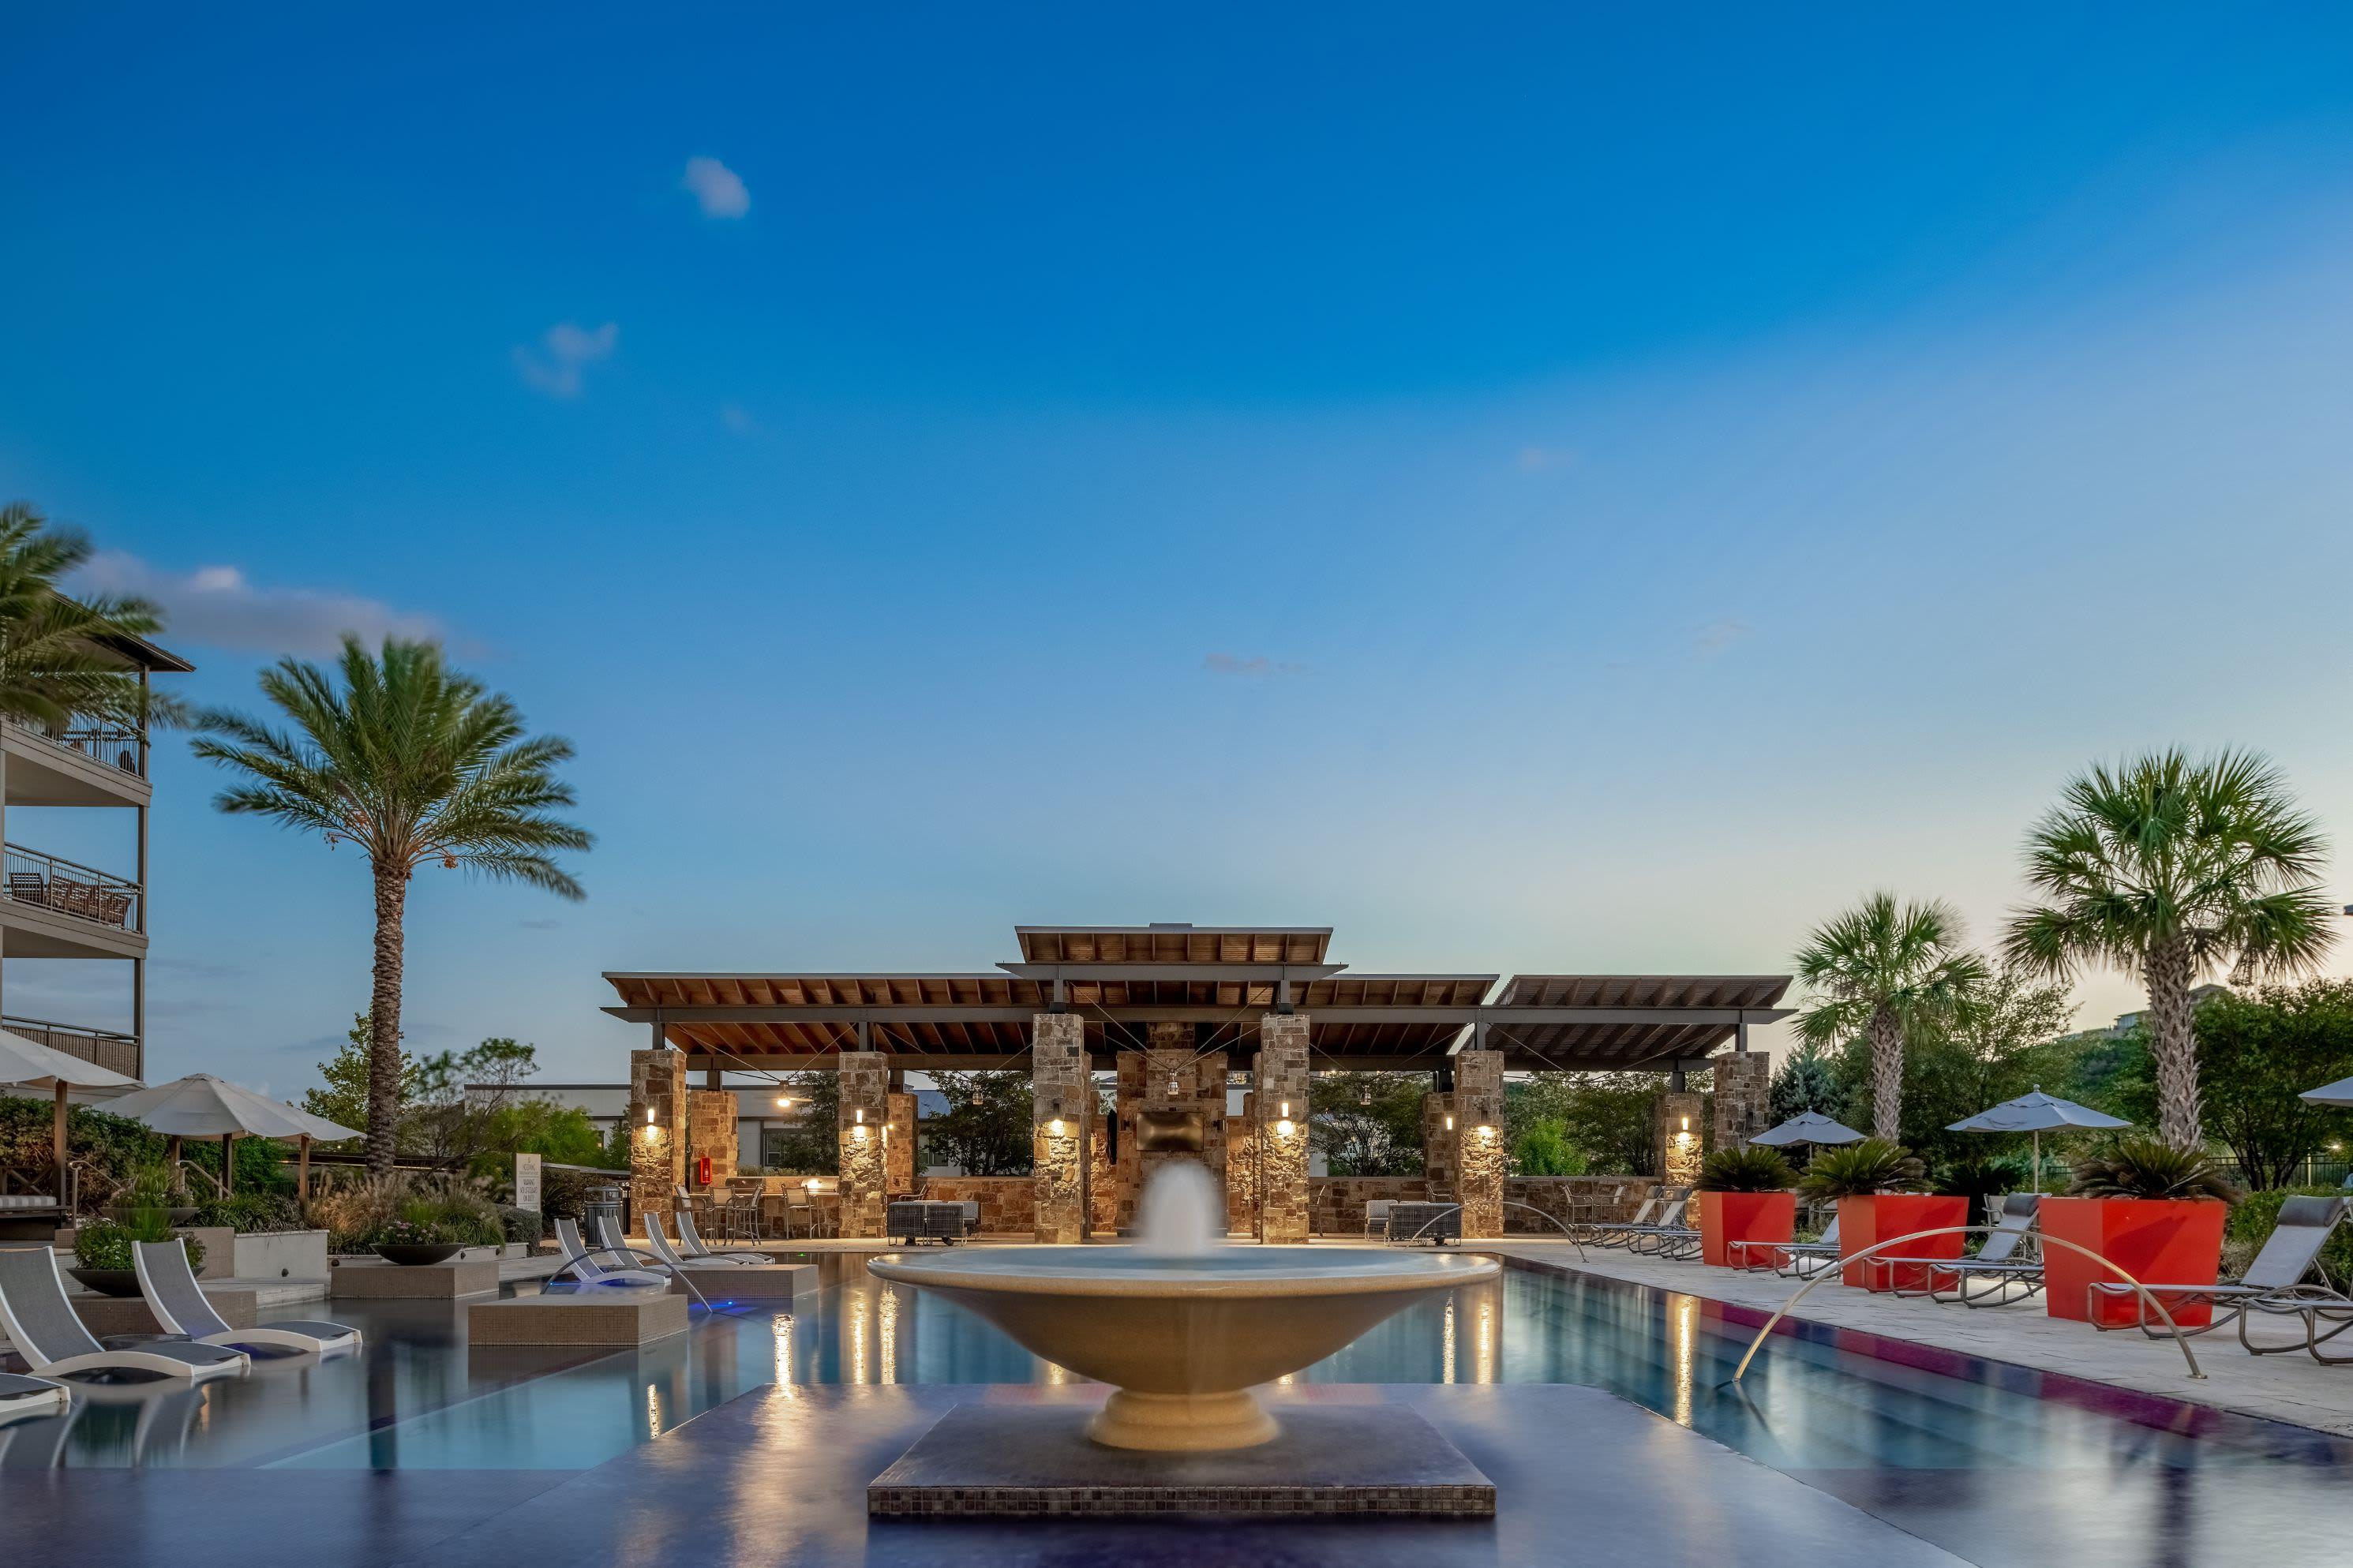 Swimming pool at dusk at Marquis Cresta Bella in San Antonio, Texas